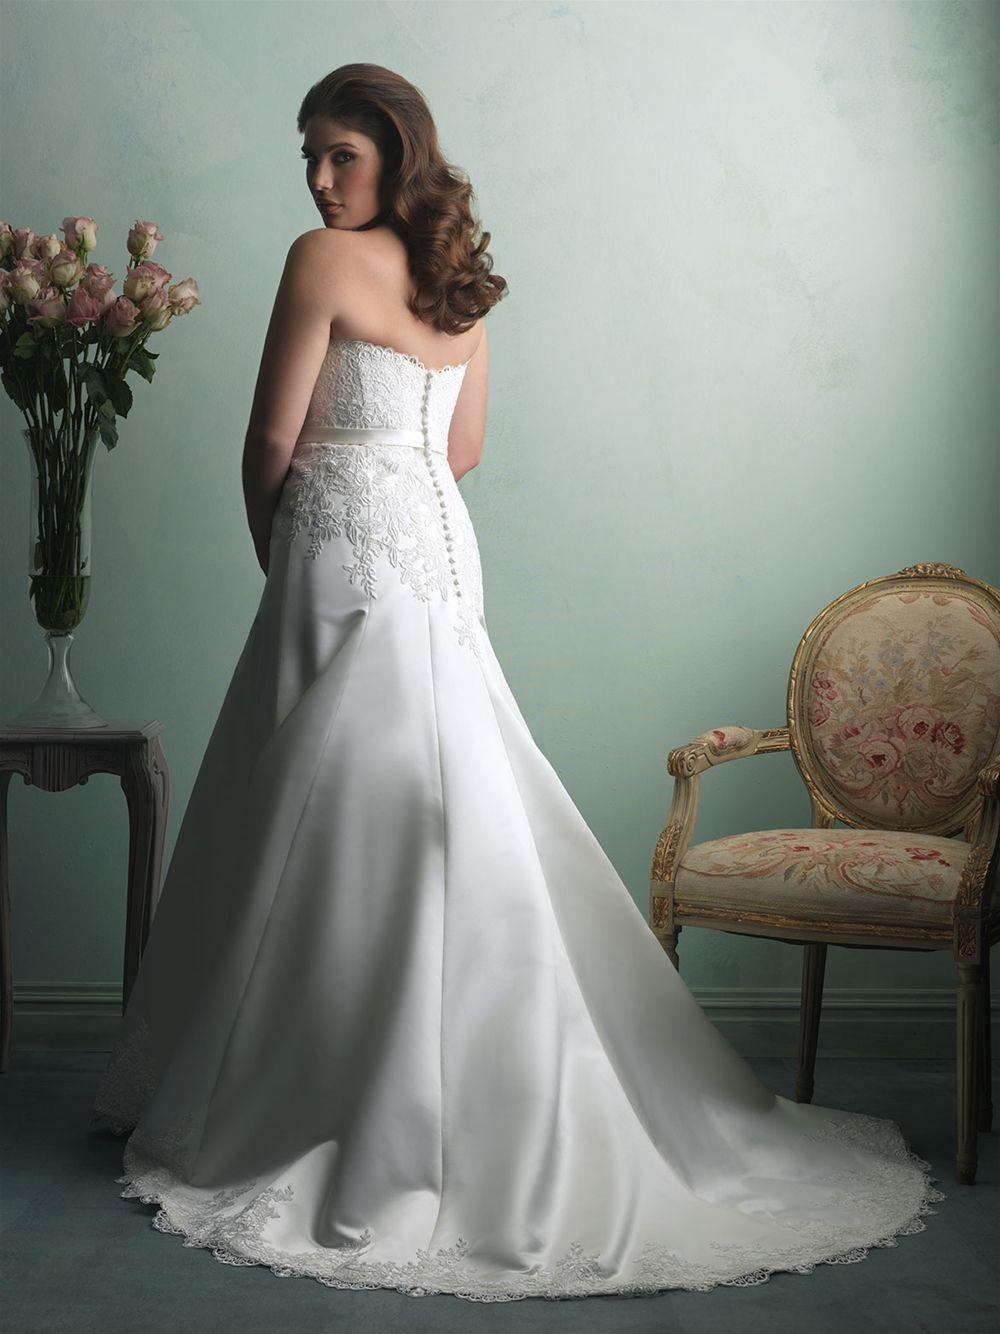 Allure wedding dress  Allure Bridals Style W  ALLURE W O M E N  Pinterest  Allure